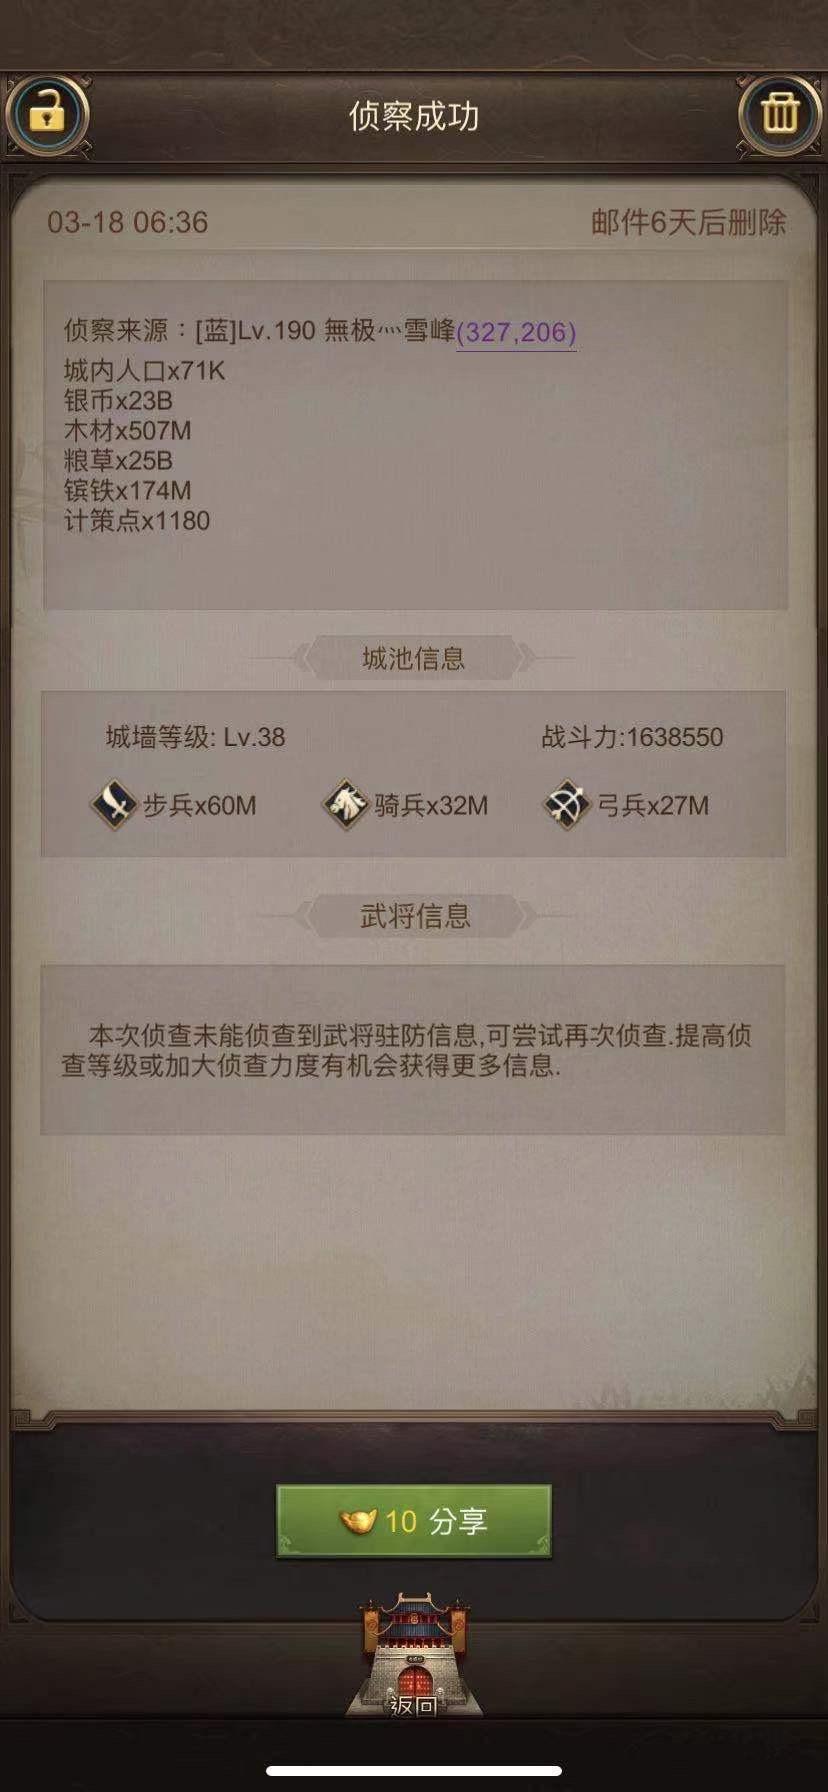 CE046B26-8A65-4E7C-92E5-964680460787.jpeg